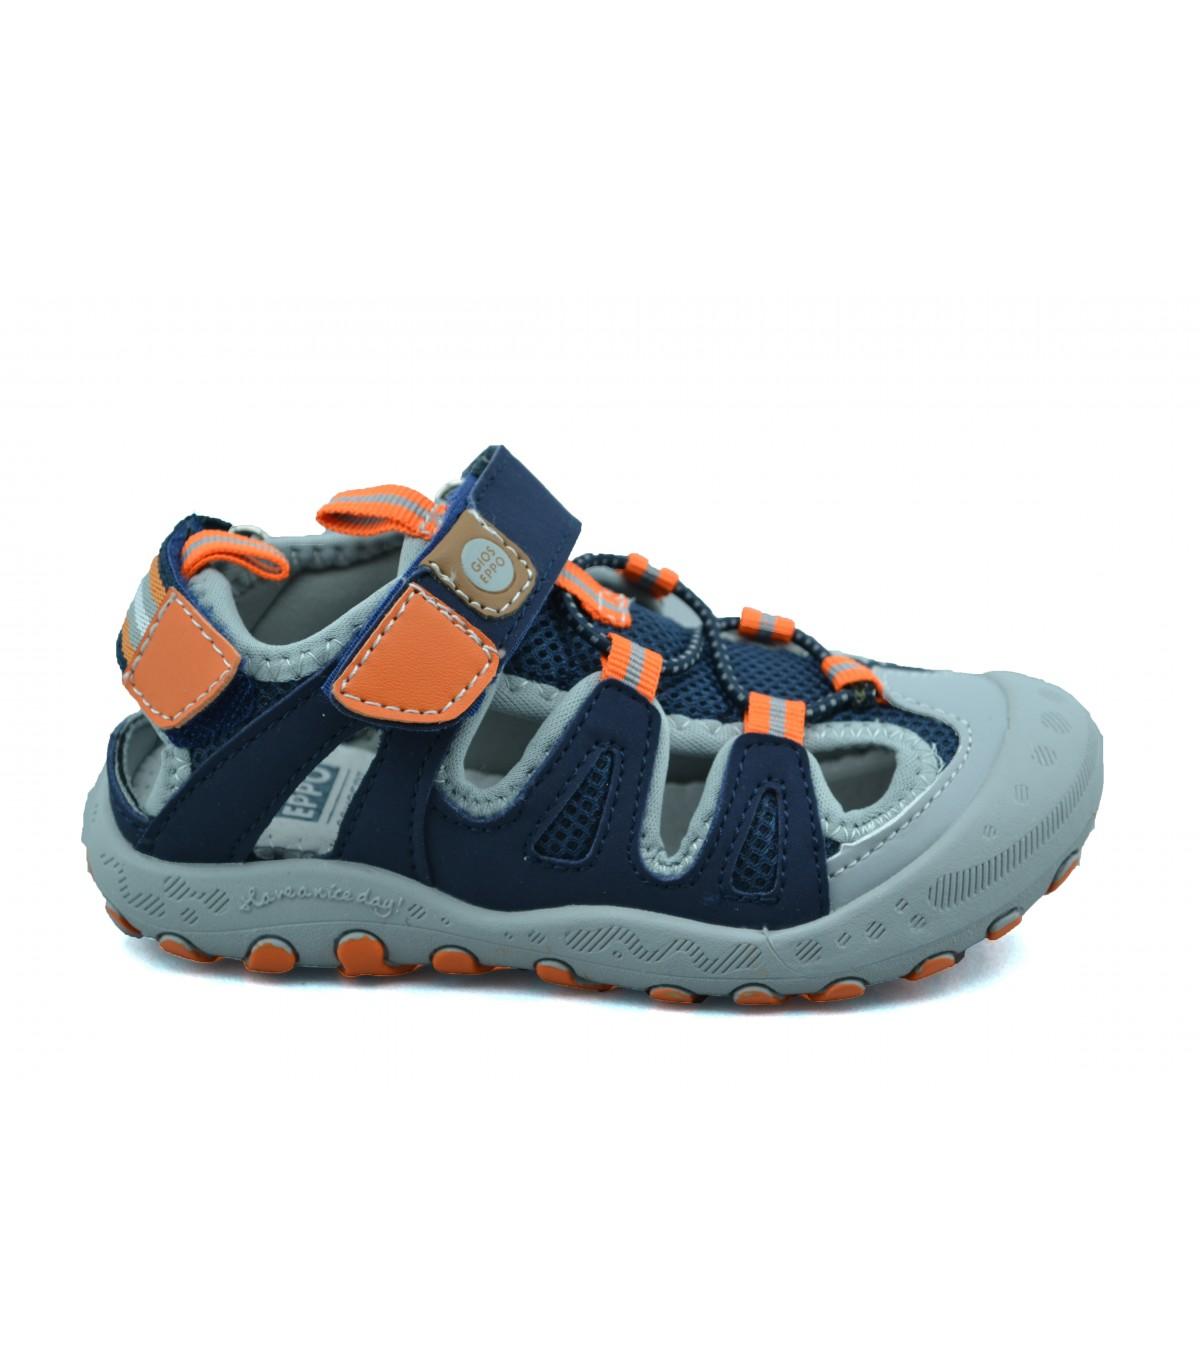 909df55a Sandalias niño GIOSEPPO Bayama | Zapatos Online |Calzado Niño